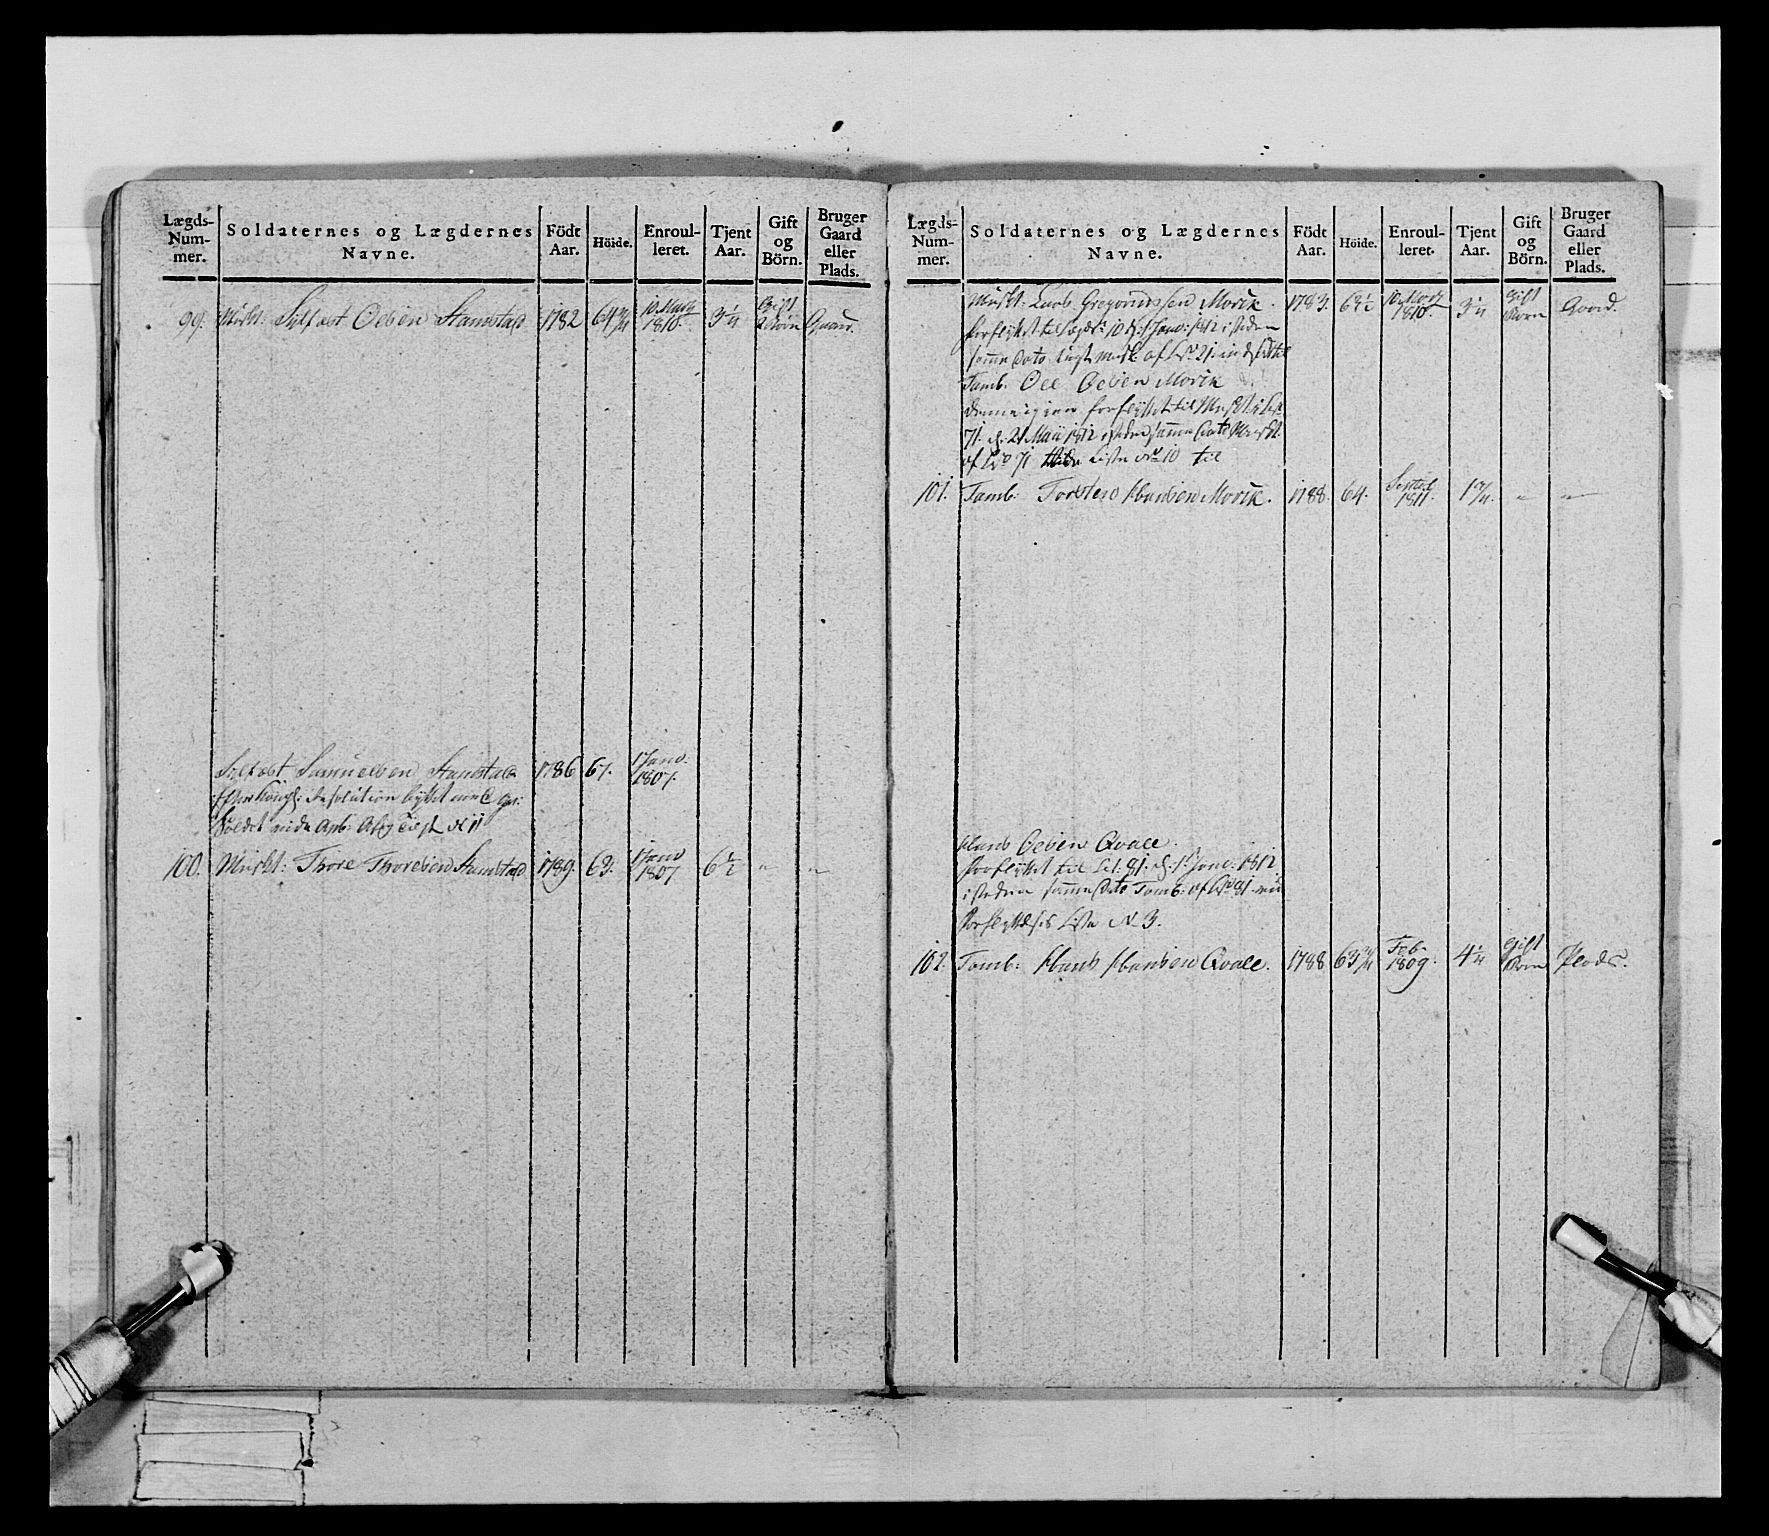 RA, Generalitets- og kommissariatskollegiet, Det kongelige norske kommissariatskollegium, E/Eh/L0069: Opplandske gevorbne infanteriregiment, 1810-1818, s. 644